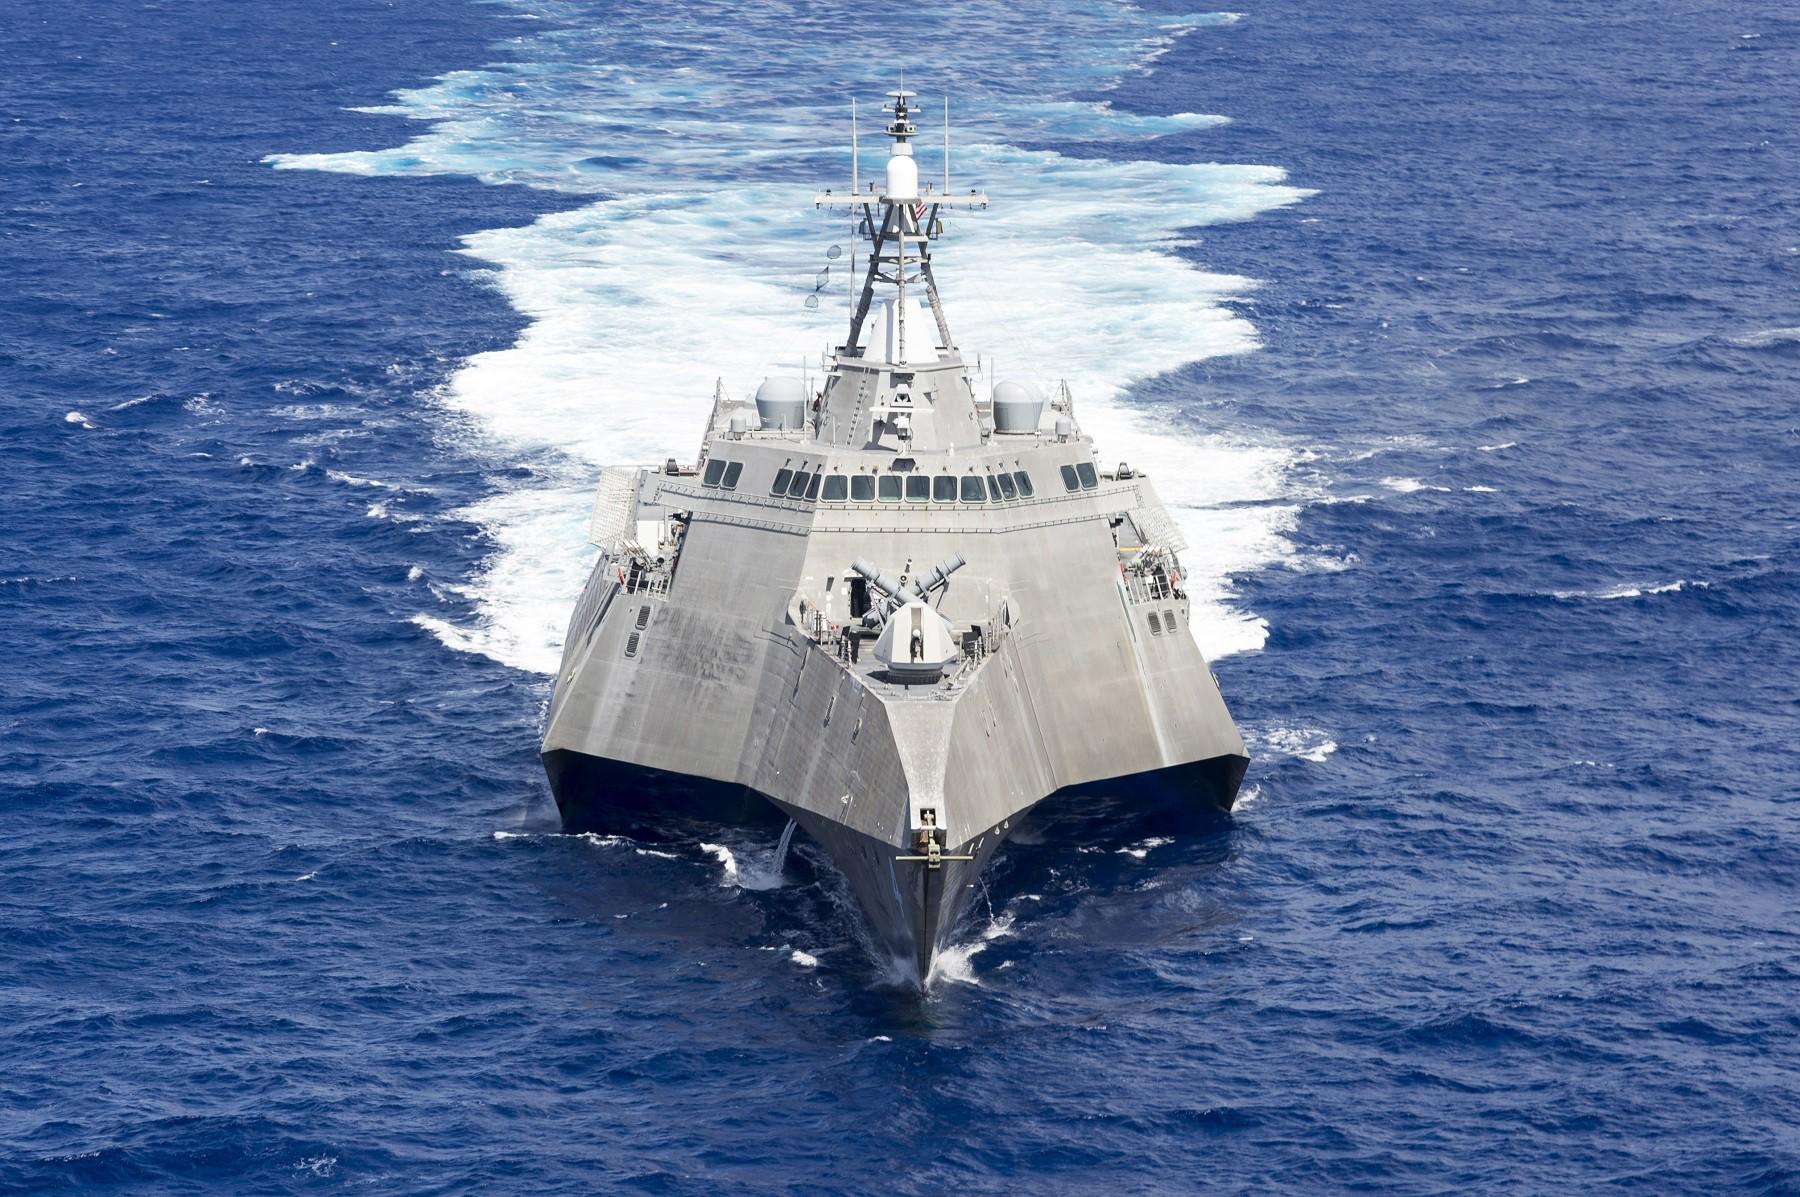 The 'Independence'-class Littoral Combat Ship USS 'Coronado' in October 2016. U.S. Navy photo